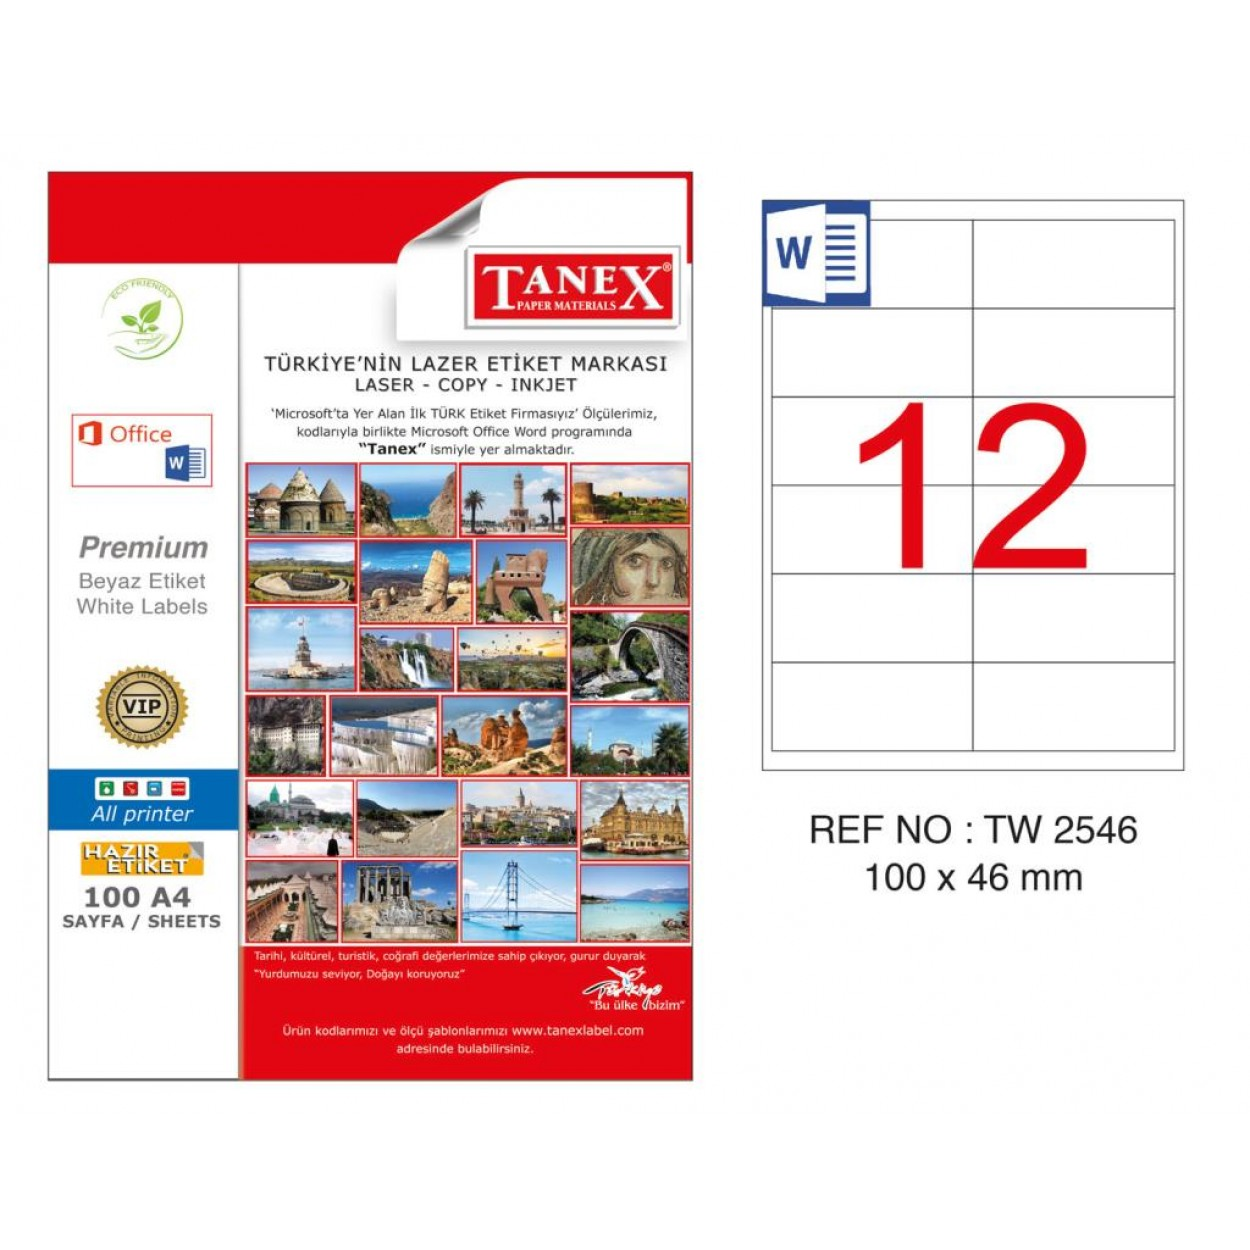 Tanex TW-2546 100x46mm Kuşe Lazer Etiket 100 Lü Paket